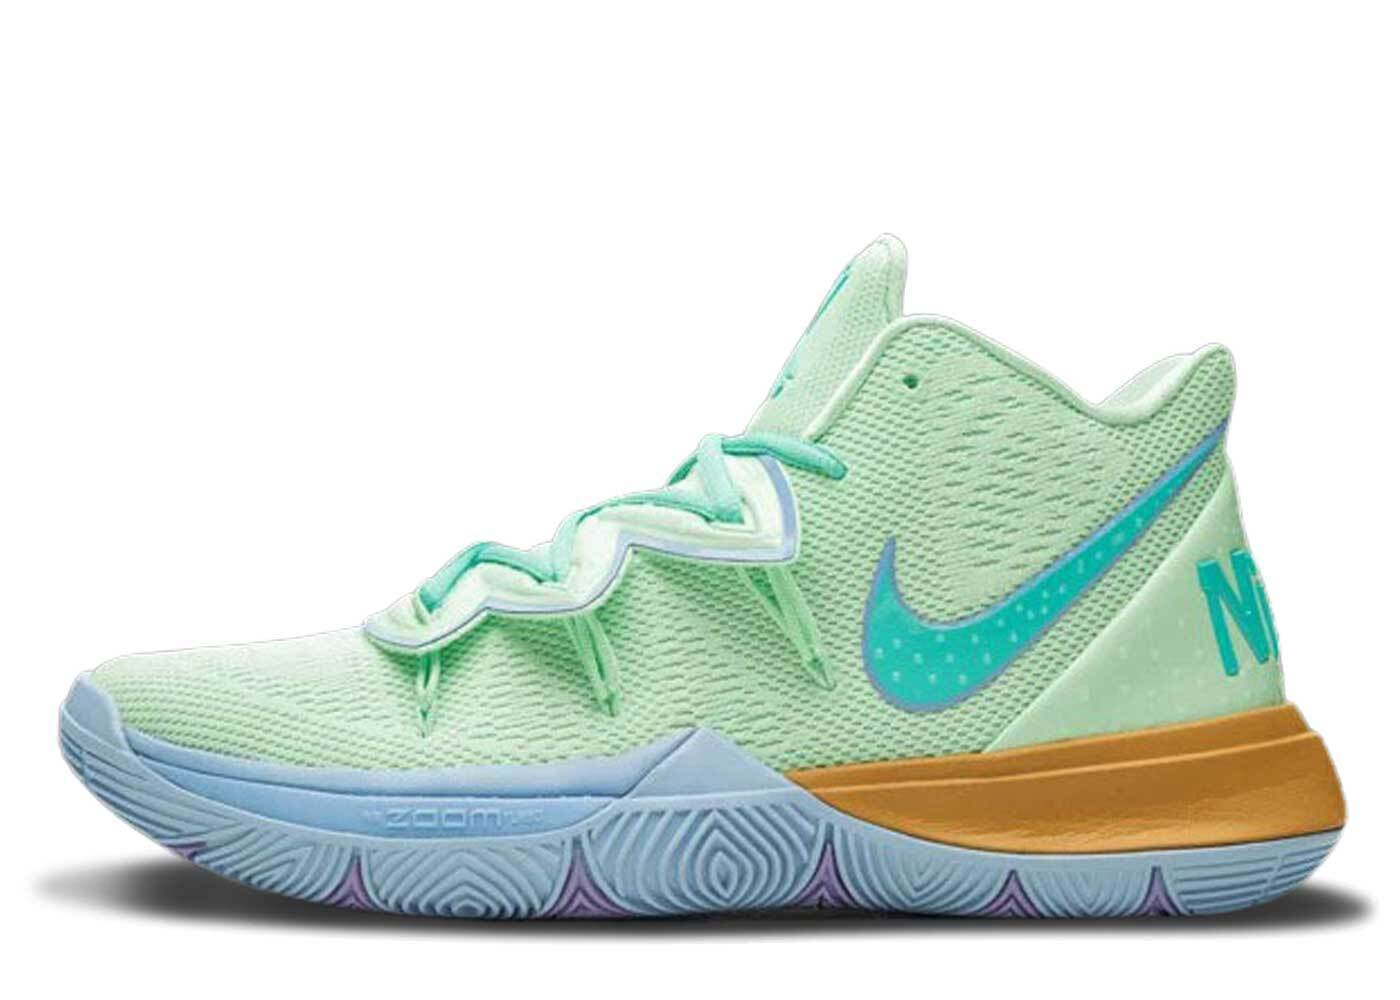 Nike Kyrie 5 Spongebob Squidwardの写真